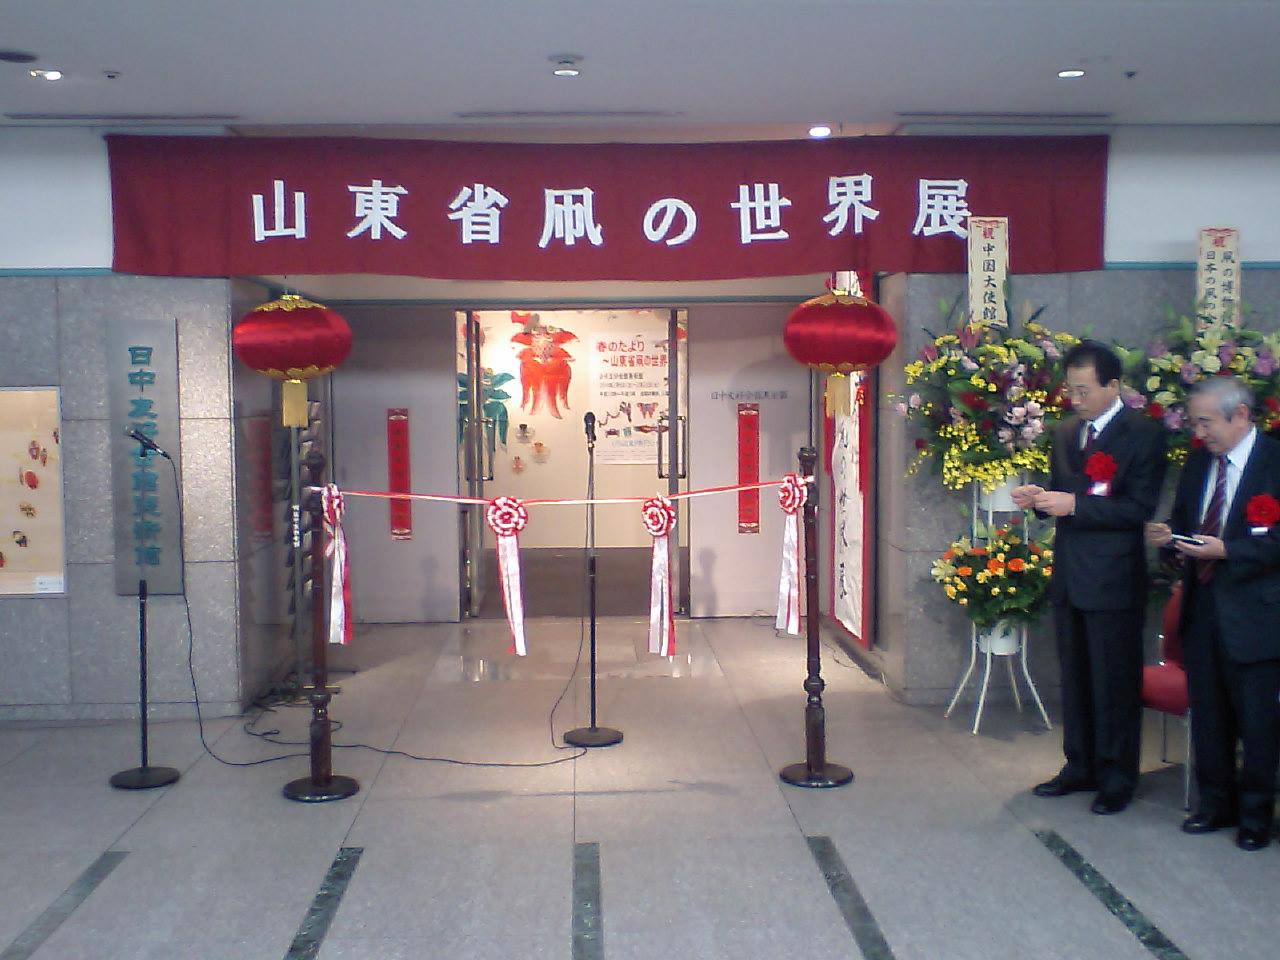 山東省凧の世界展東京で開催_d0027795_1505417.jpg